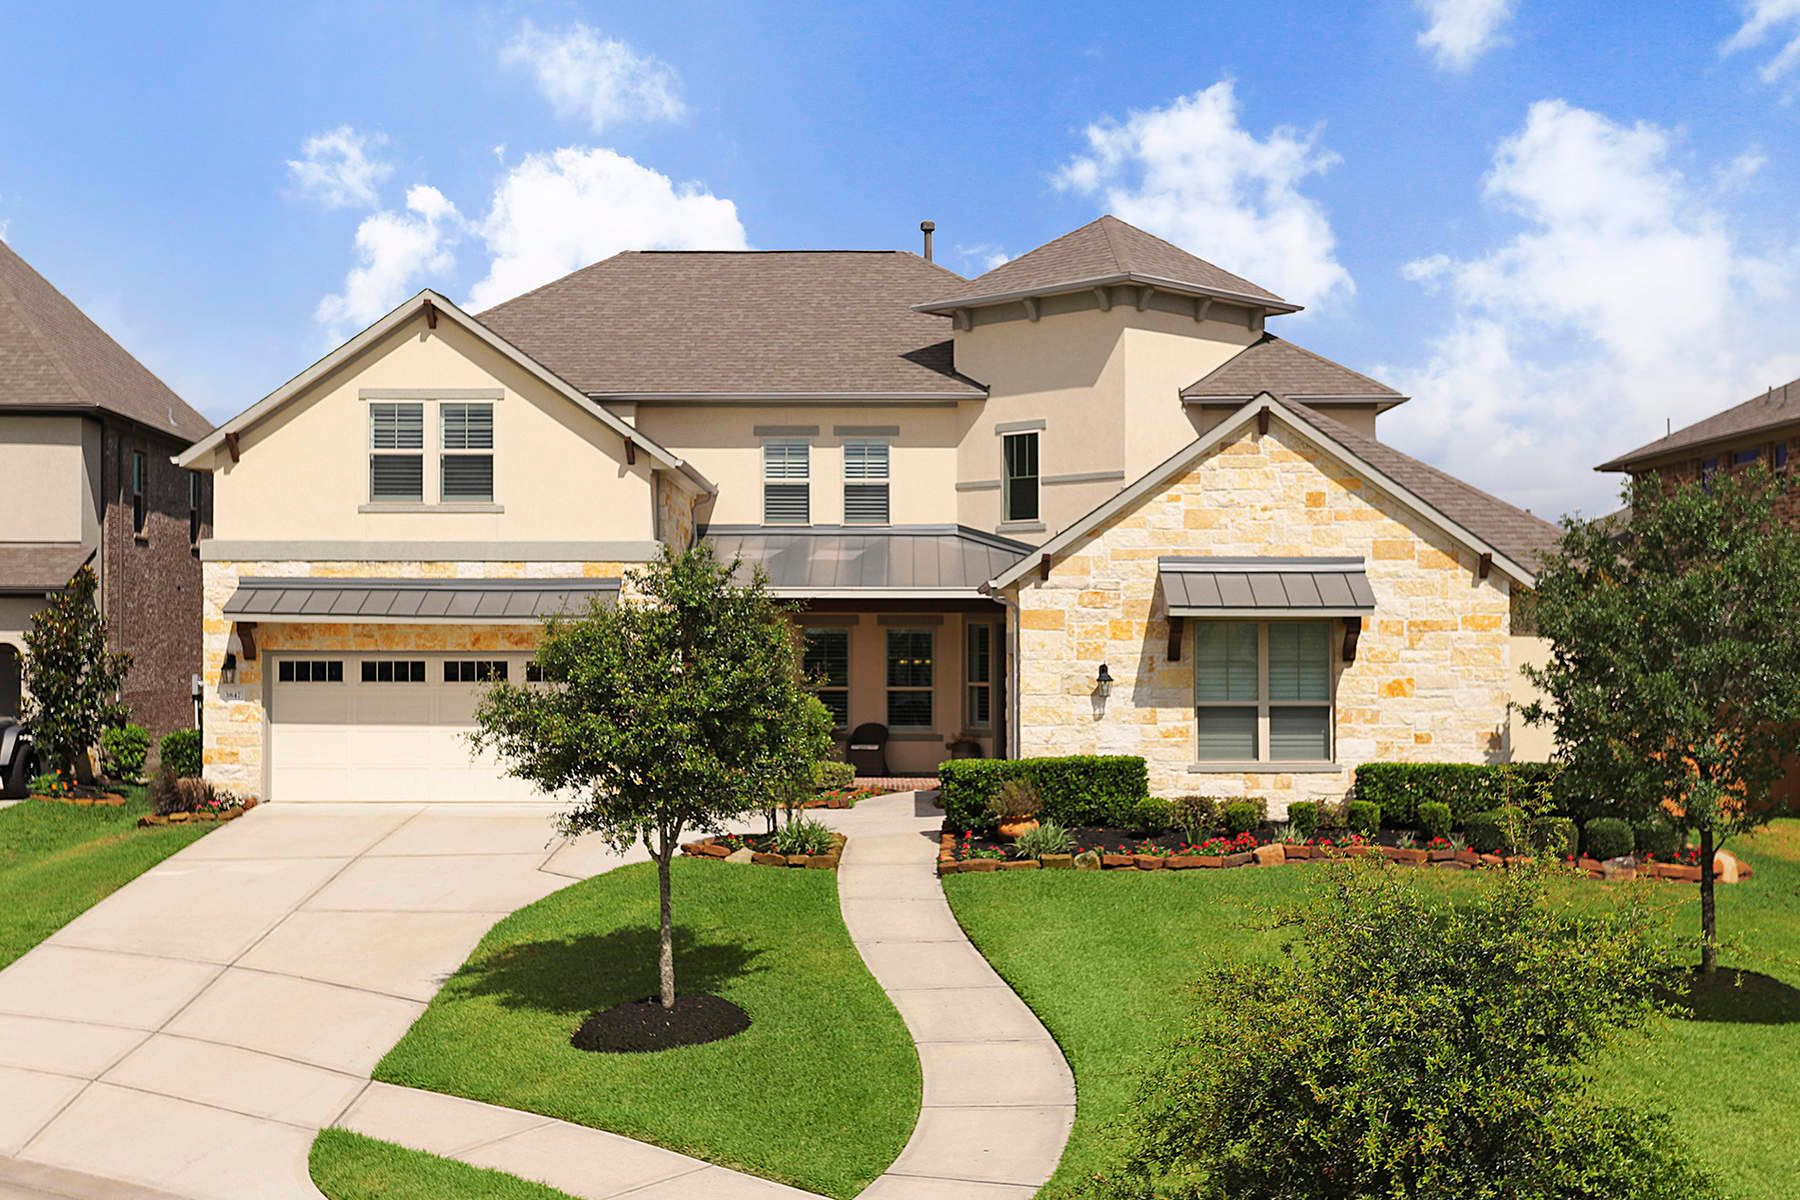 Single Family Home for Sale at 3847 Dortmund 3847 Dortmund Spring, Texas 77386 United States